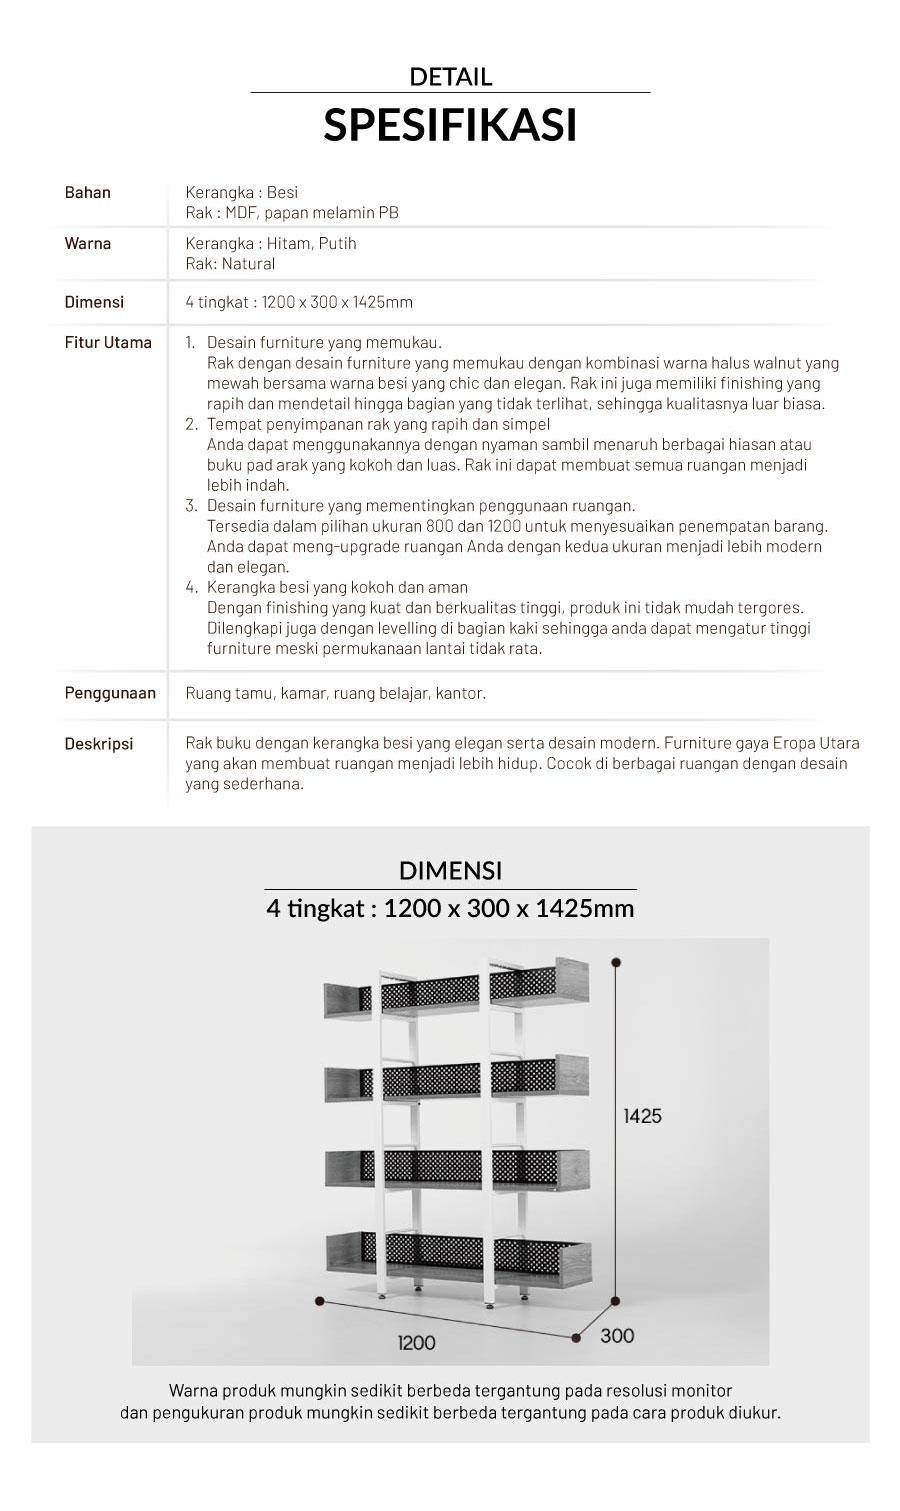 kit_1200_4_information.jpg